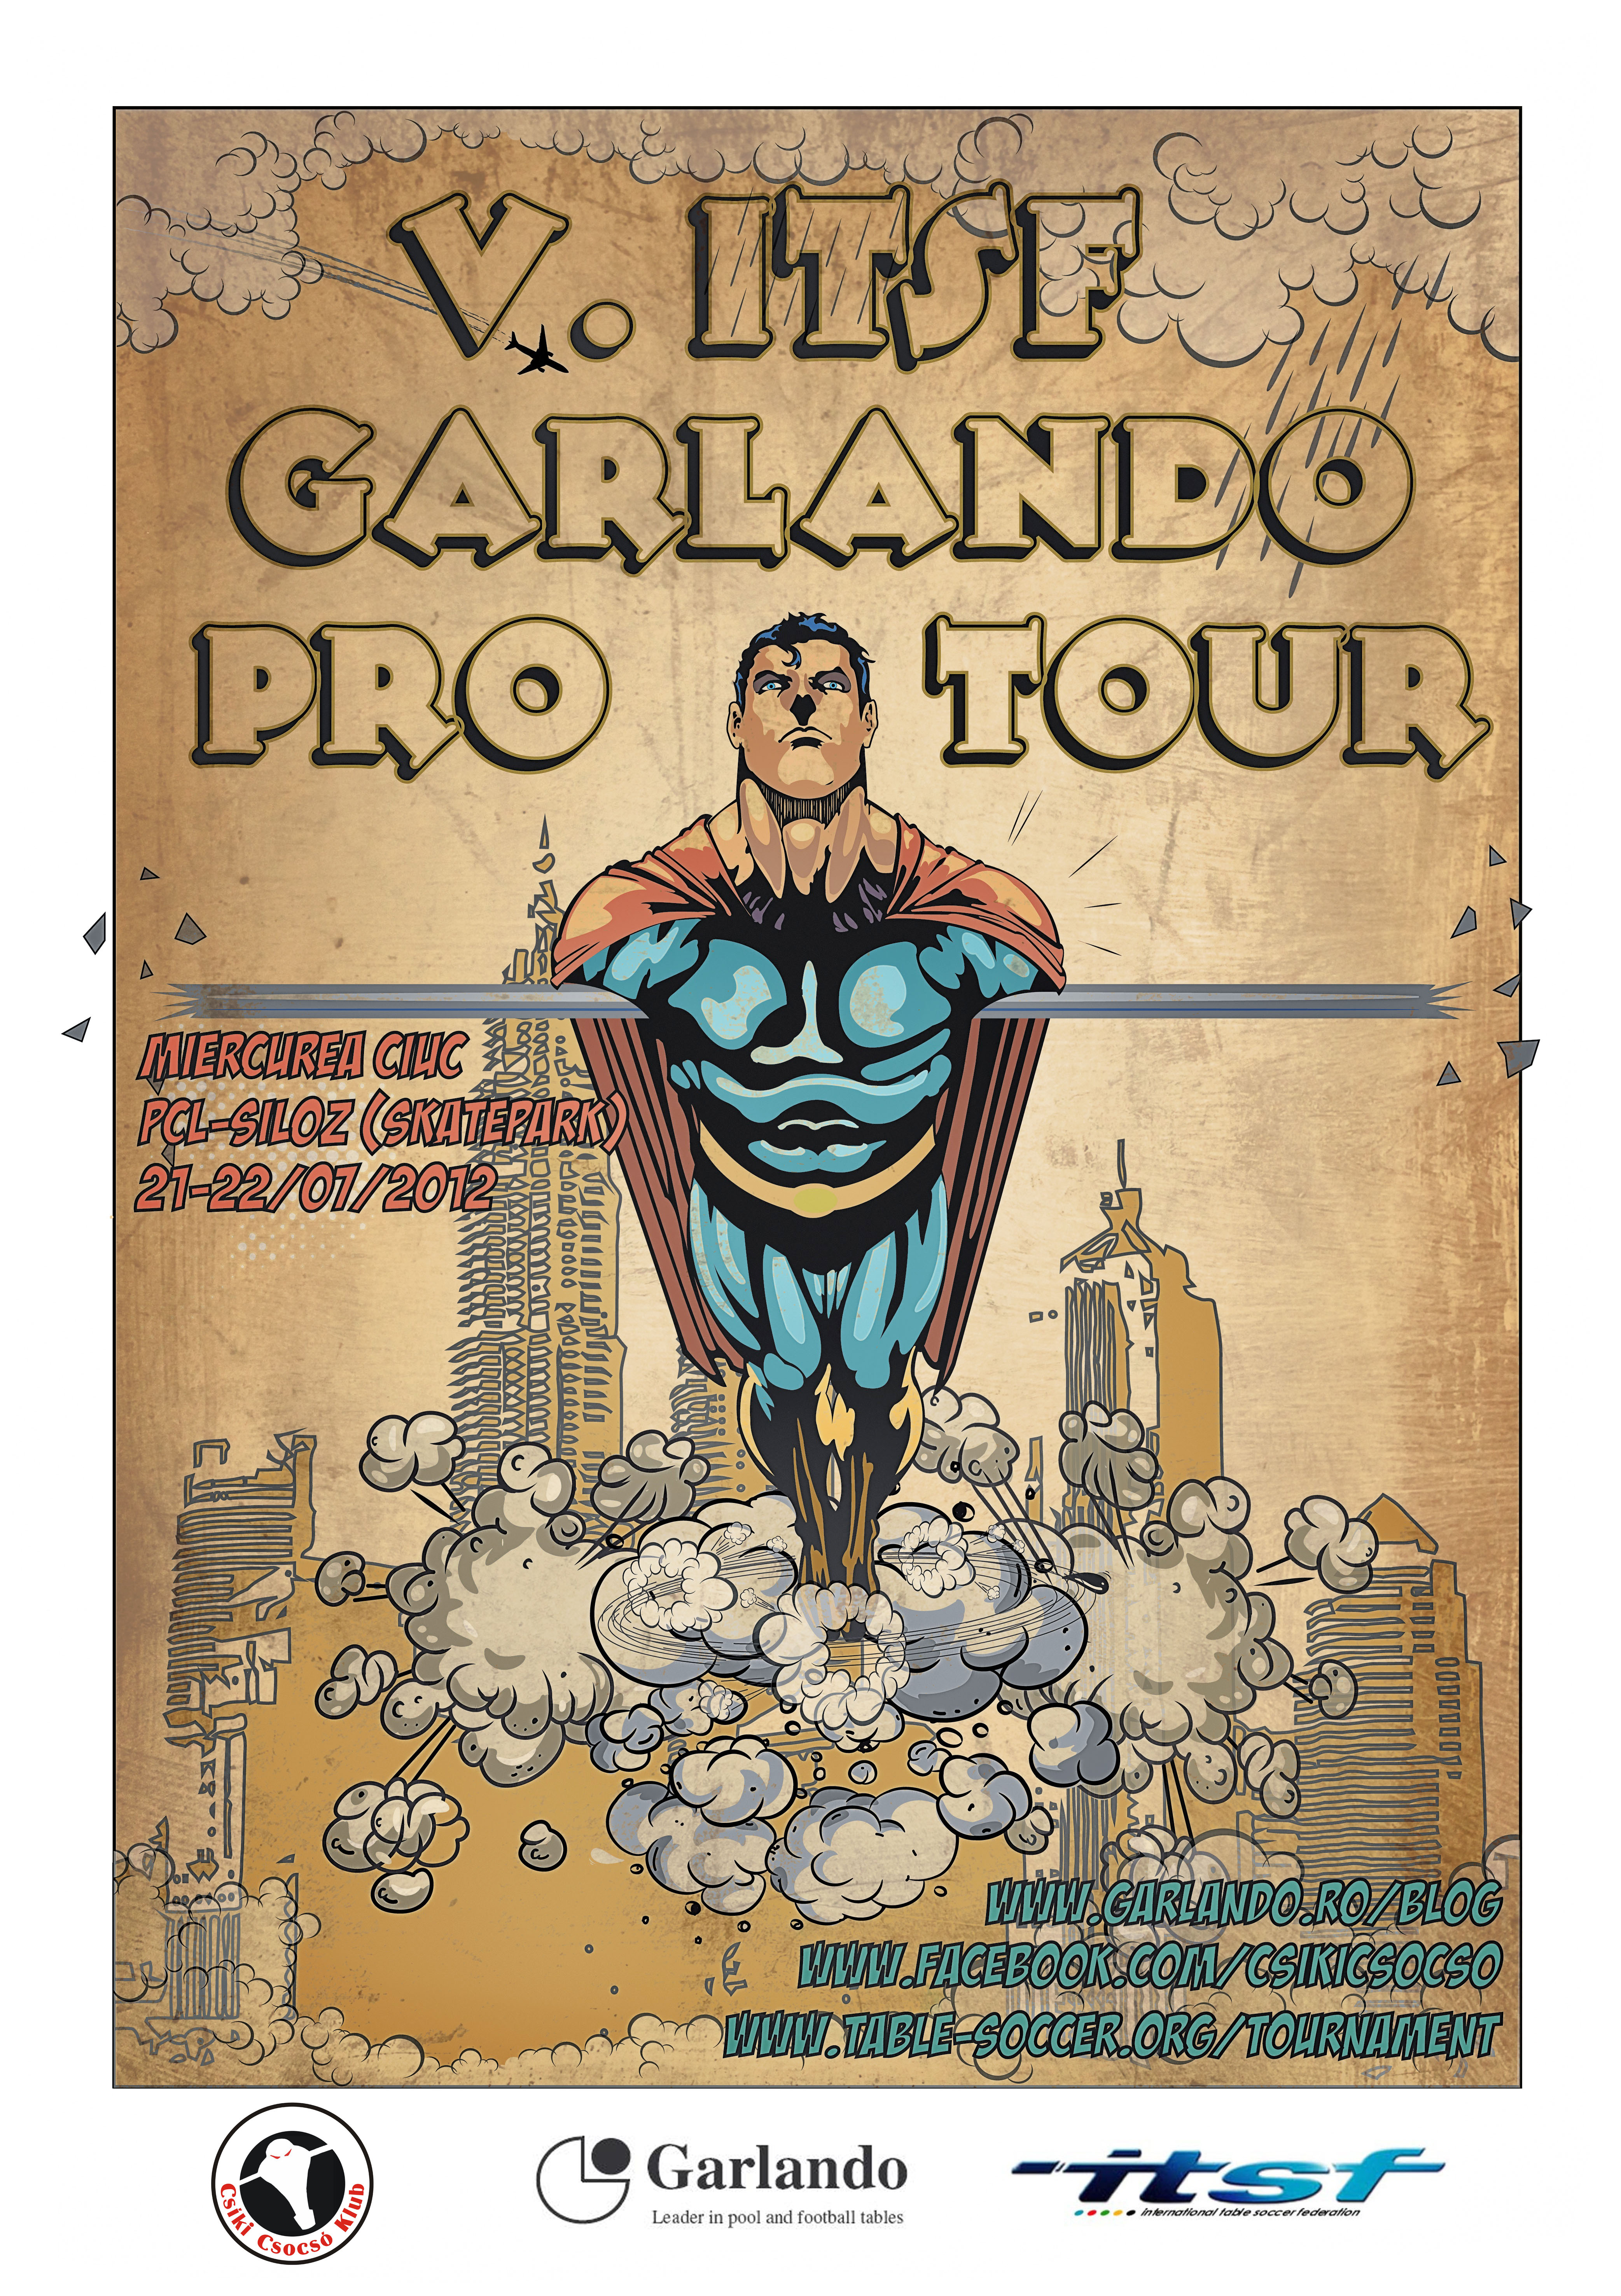 Romanian Garlando Pro Tour